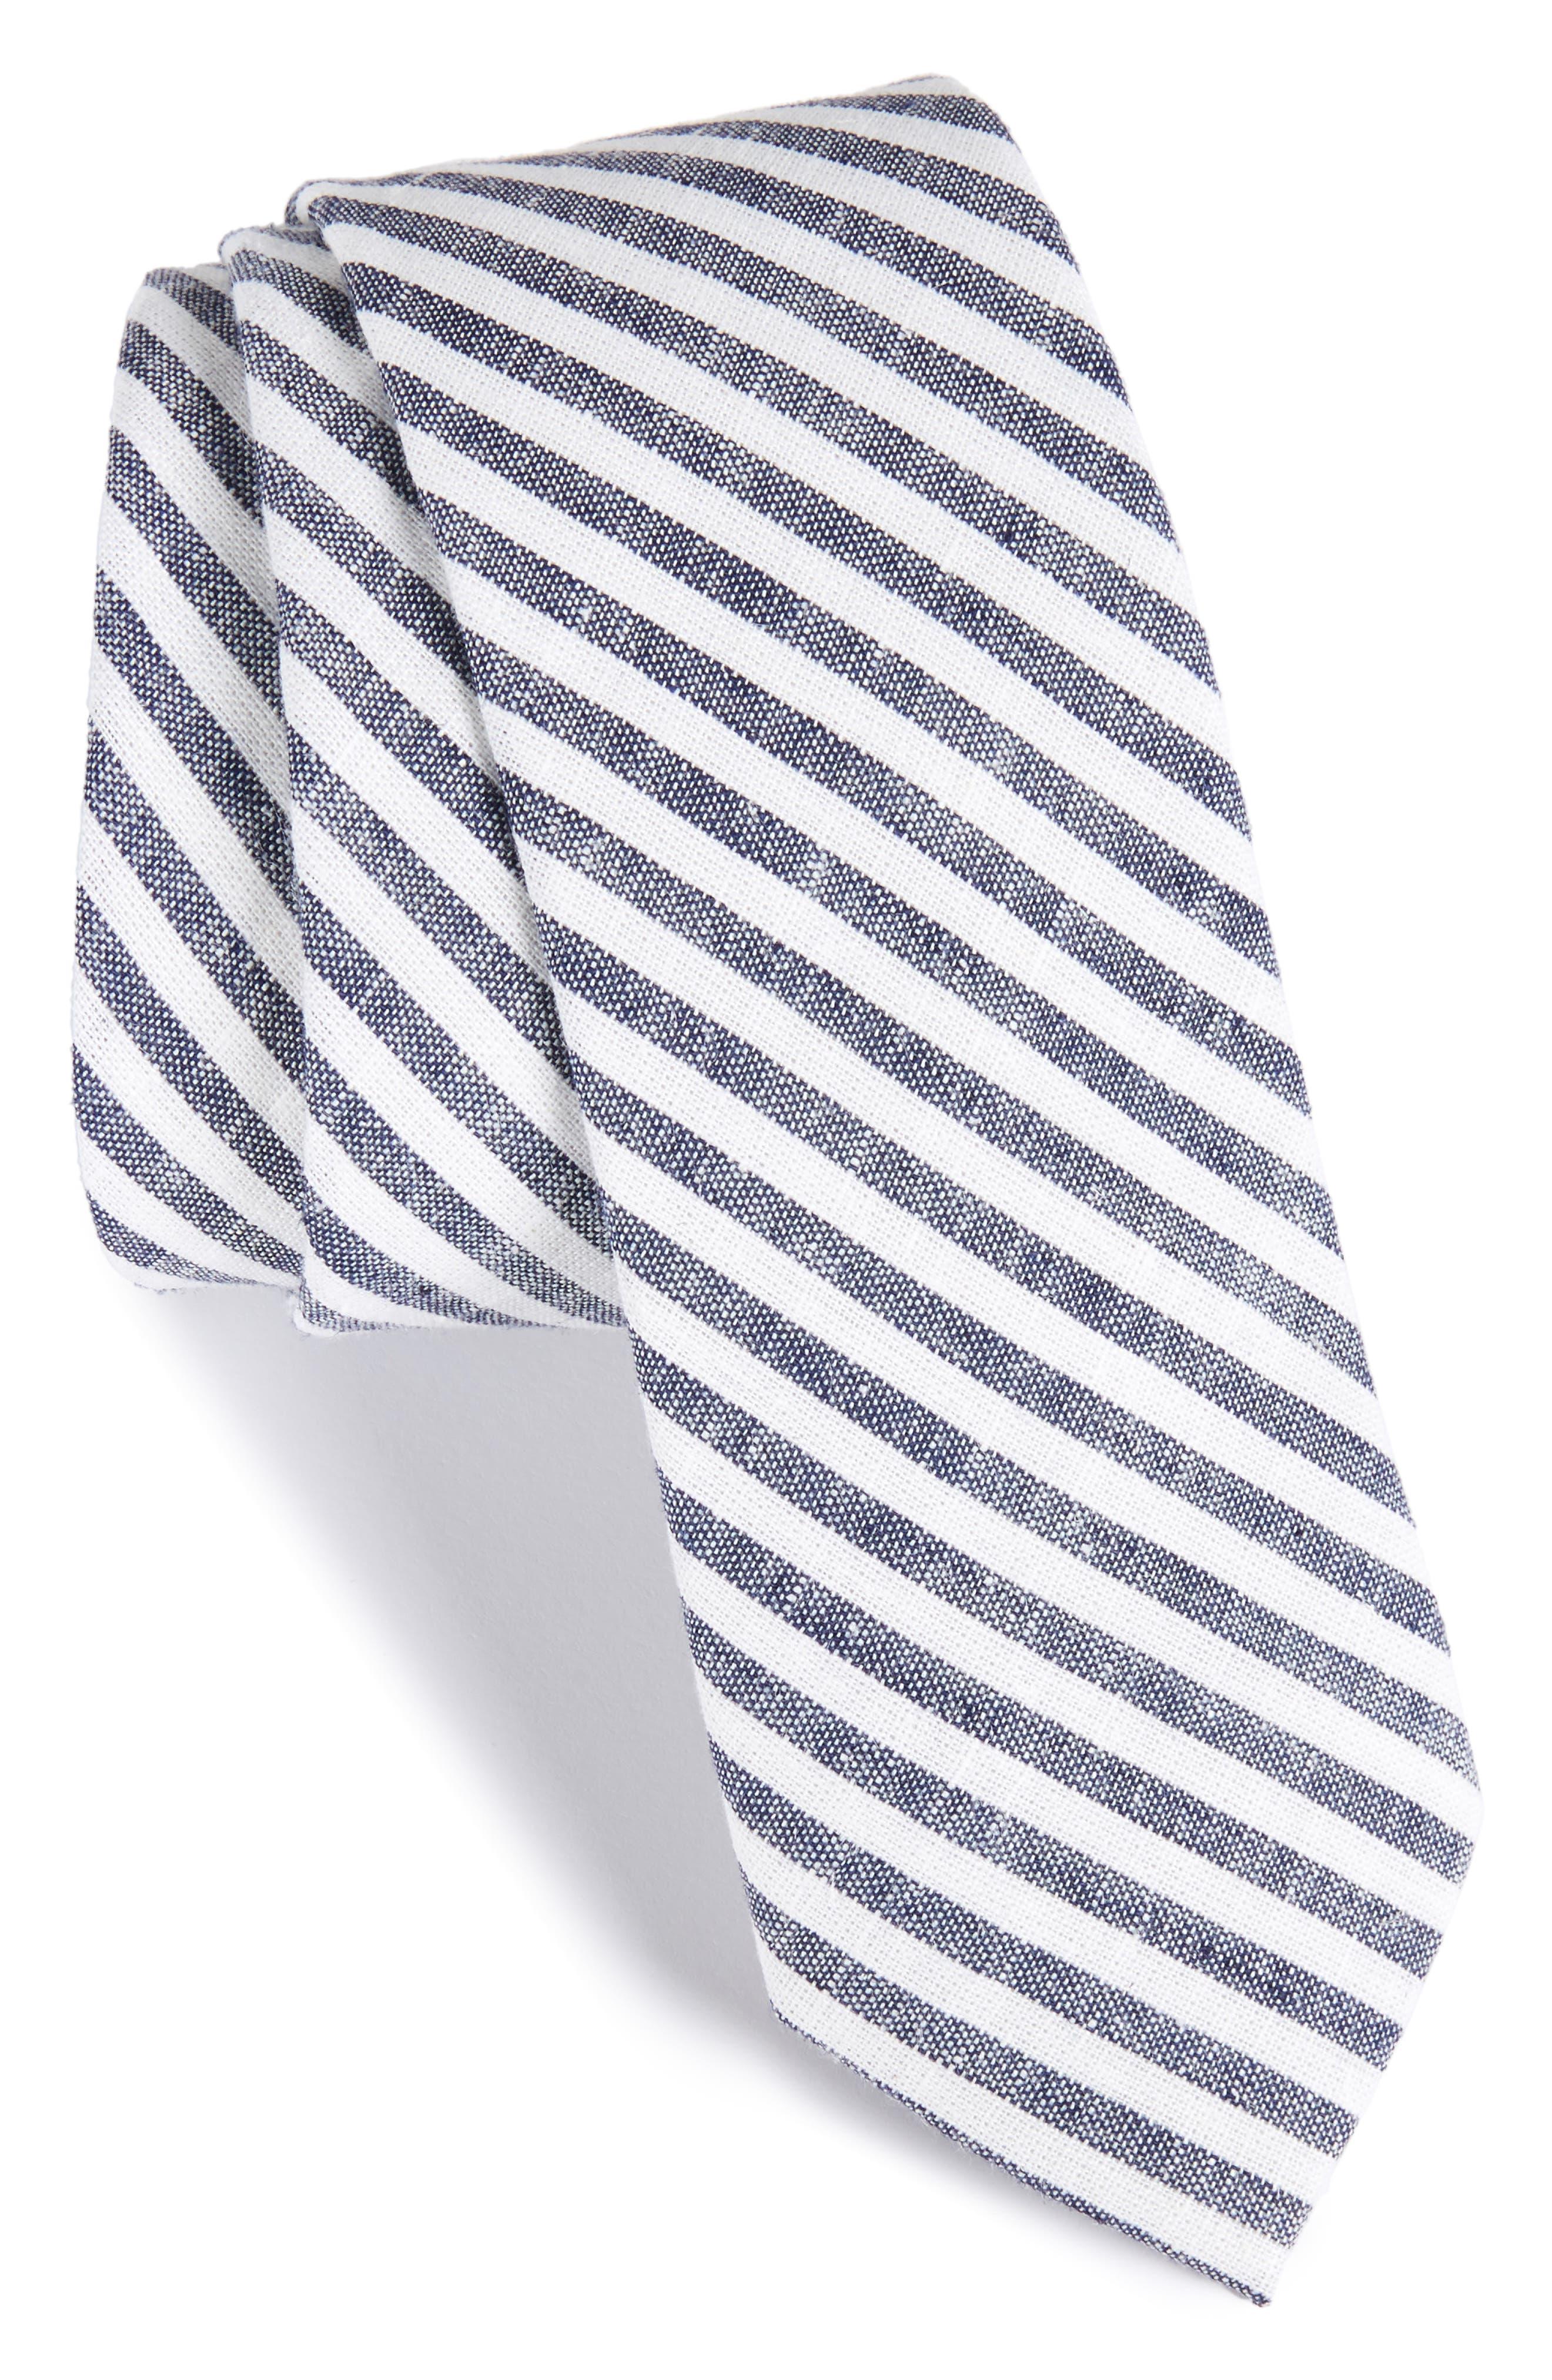 Main Image - 1901 Stripe Cotton Tie